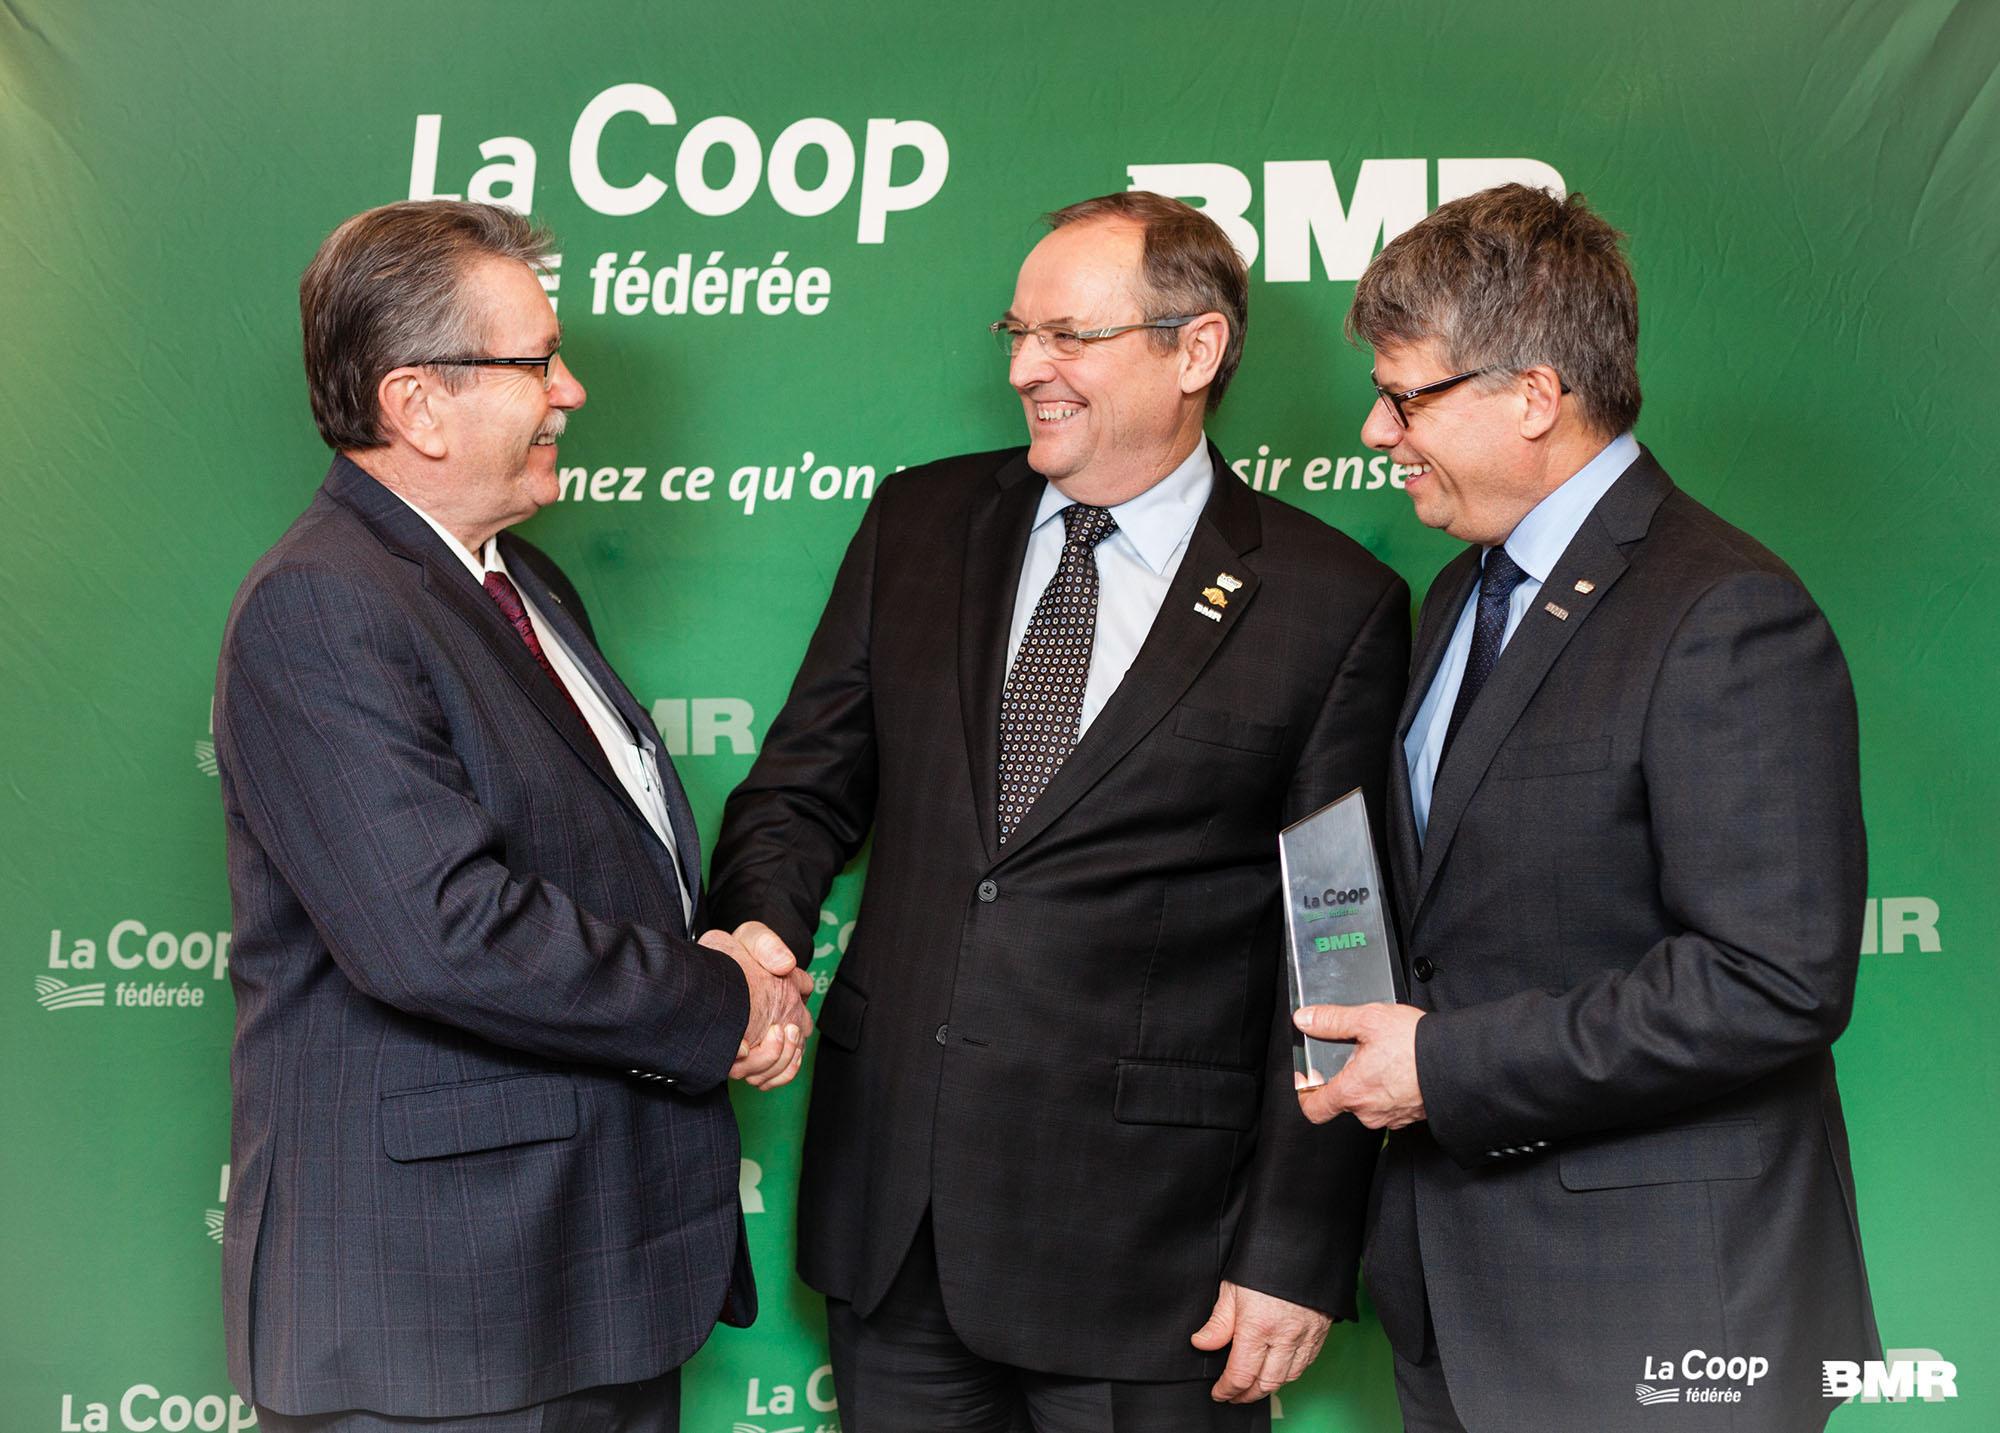 Groupe BMR becomes La Coop fédérée subsdiary